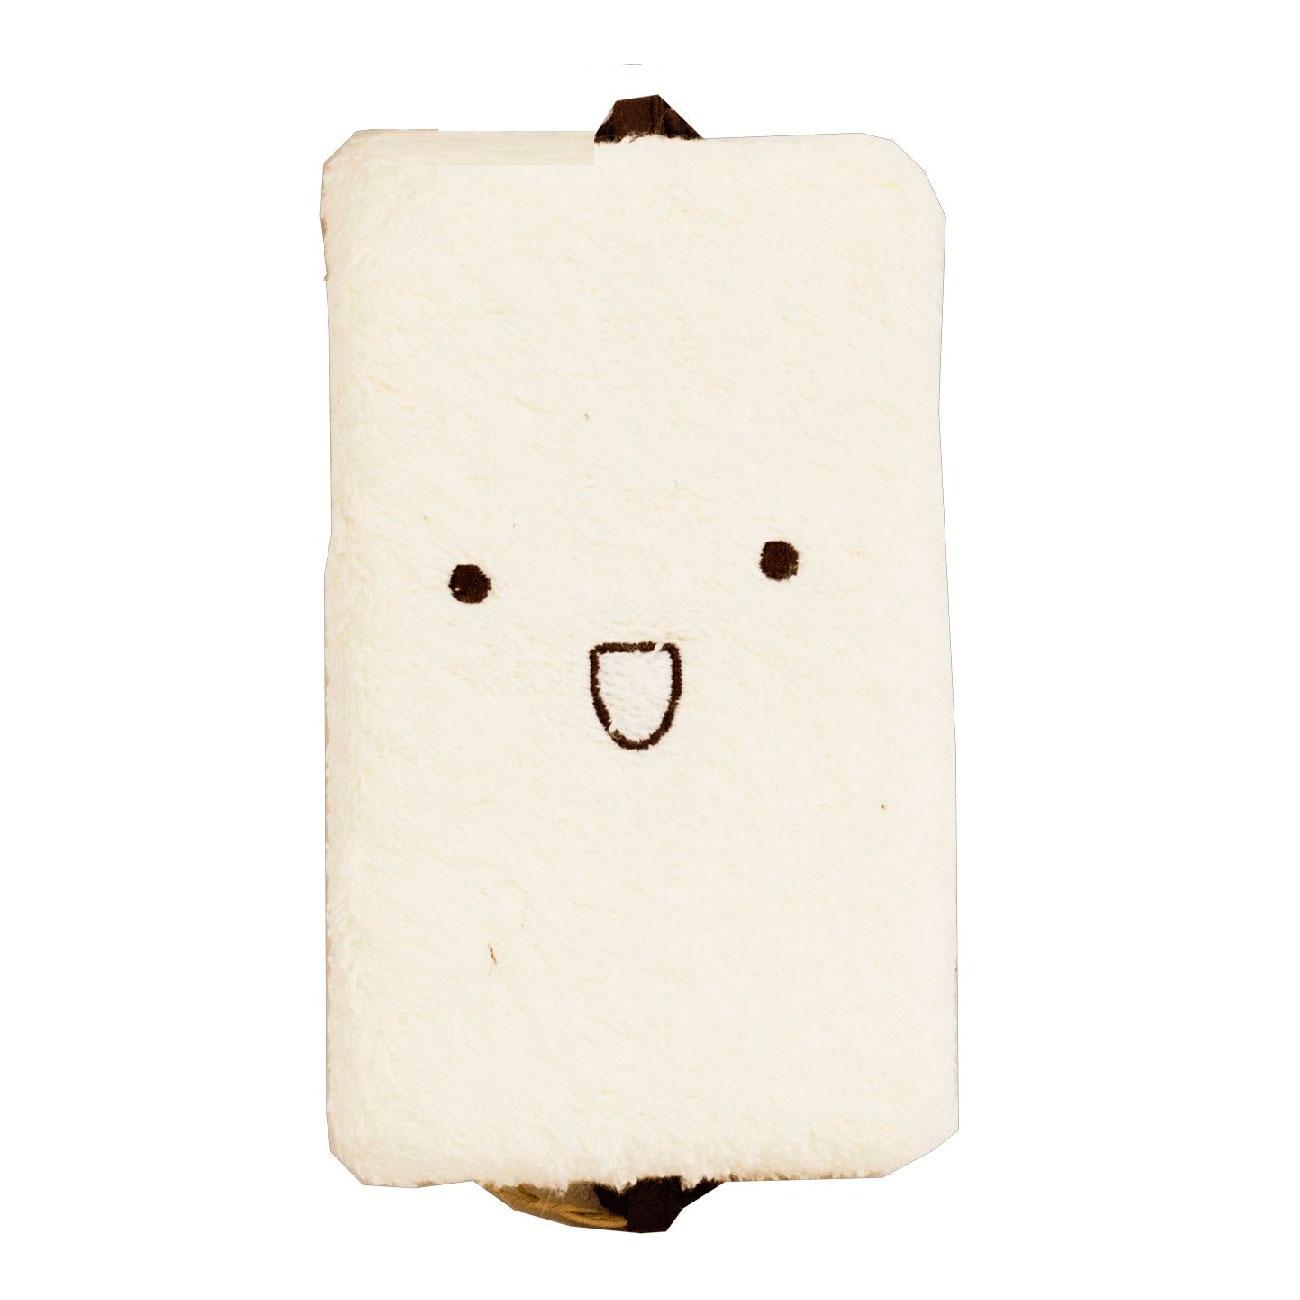 Мочалка массажная Kokubo для тела Мягкая с ручками 9 х 16 см<br>